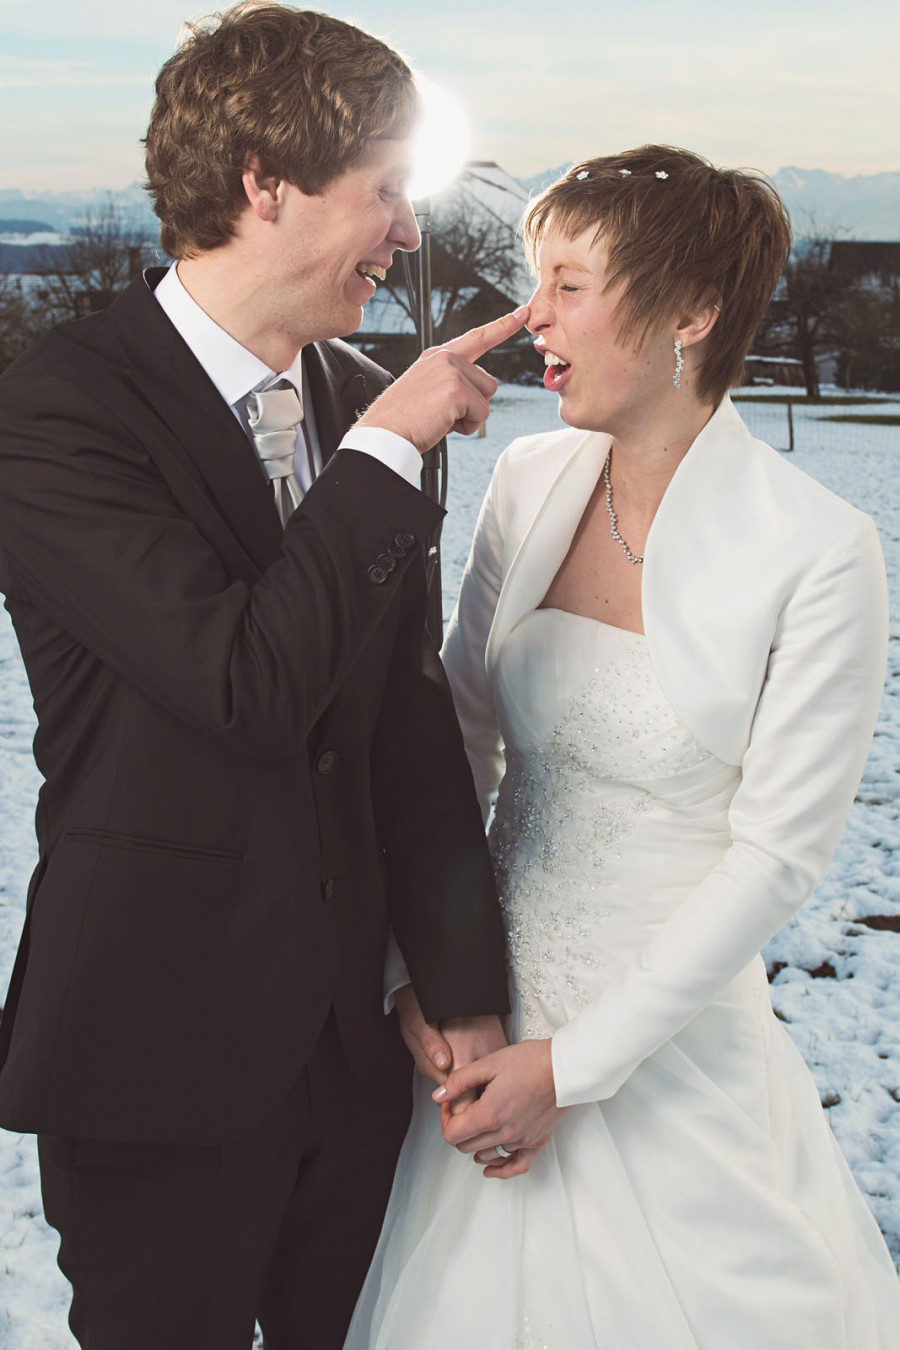 TCP_Ruf_wedding-252.jpg